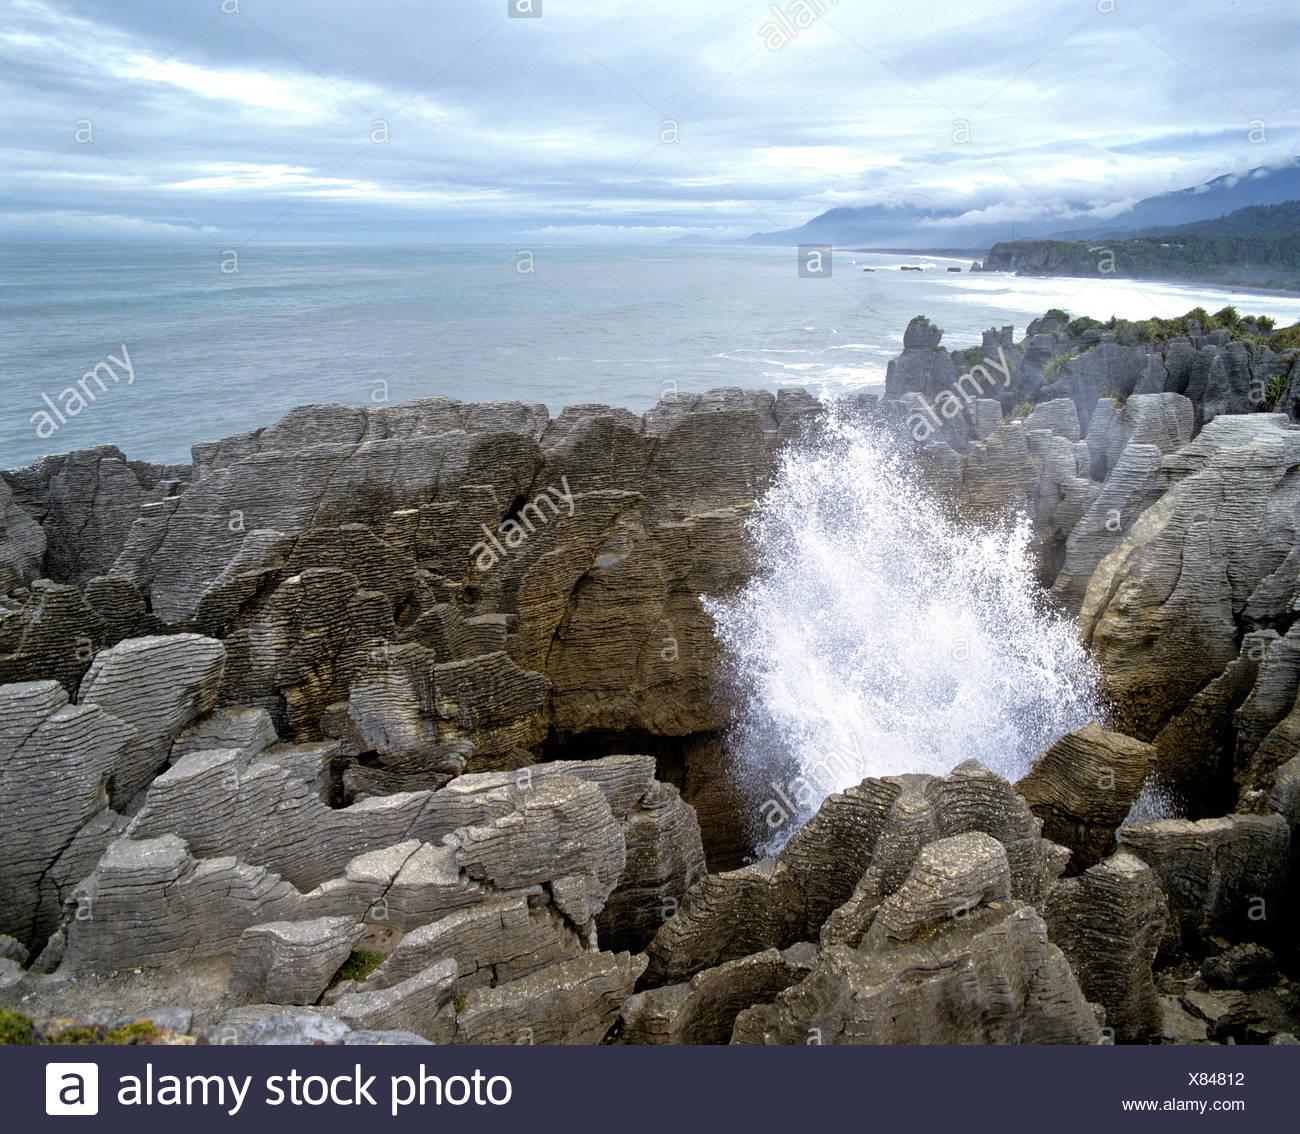 Blowhole, Pancake Rocks, Paparoa National Park, Punakaiki, South Island, New Zealand - Stock Image